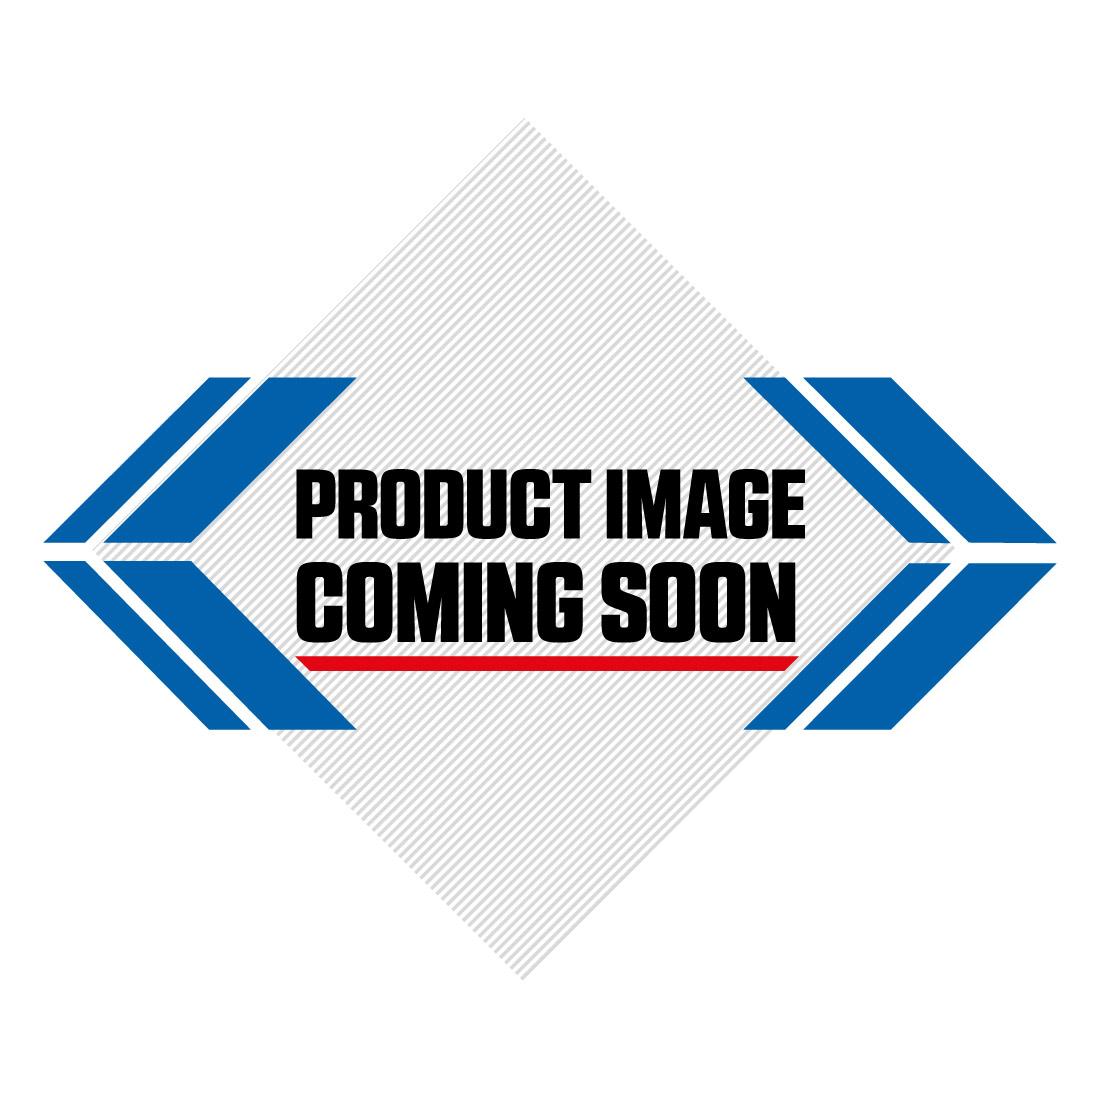 Silkolene Comp 4 10w-40 XP Ester Based Semi Synthetic Bike Engine Oil - 4 Litres Image-0